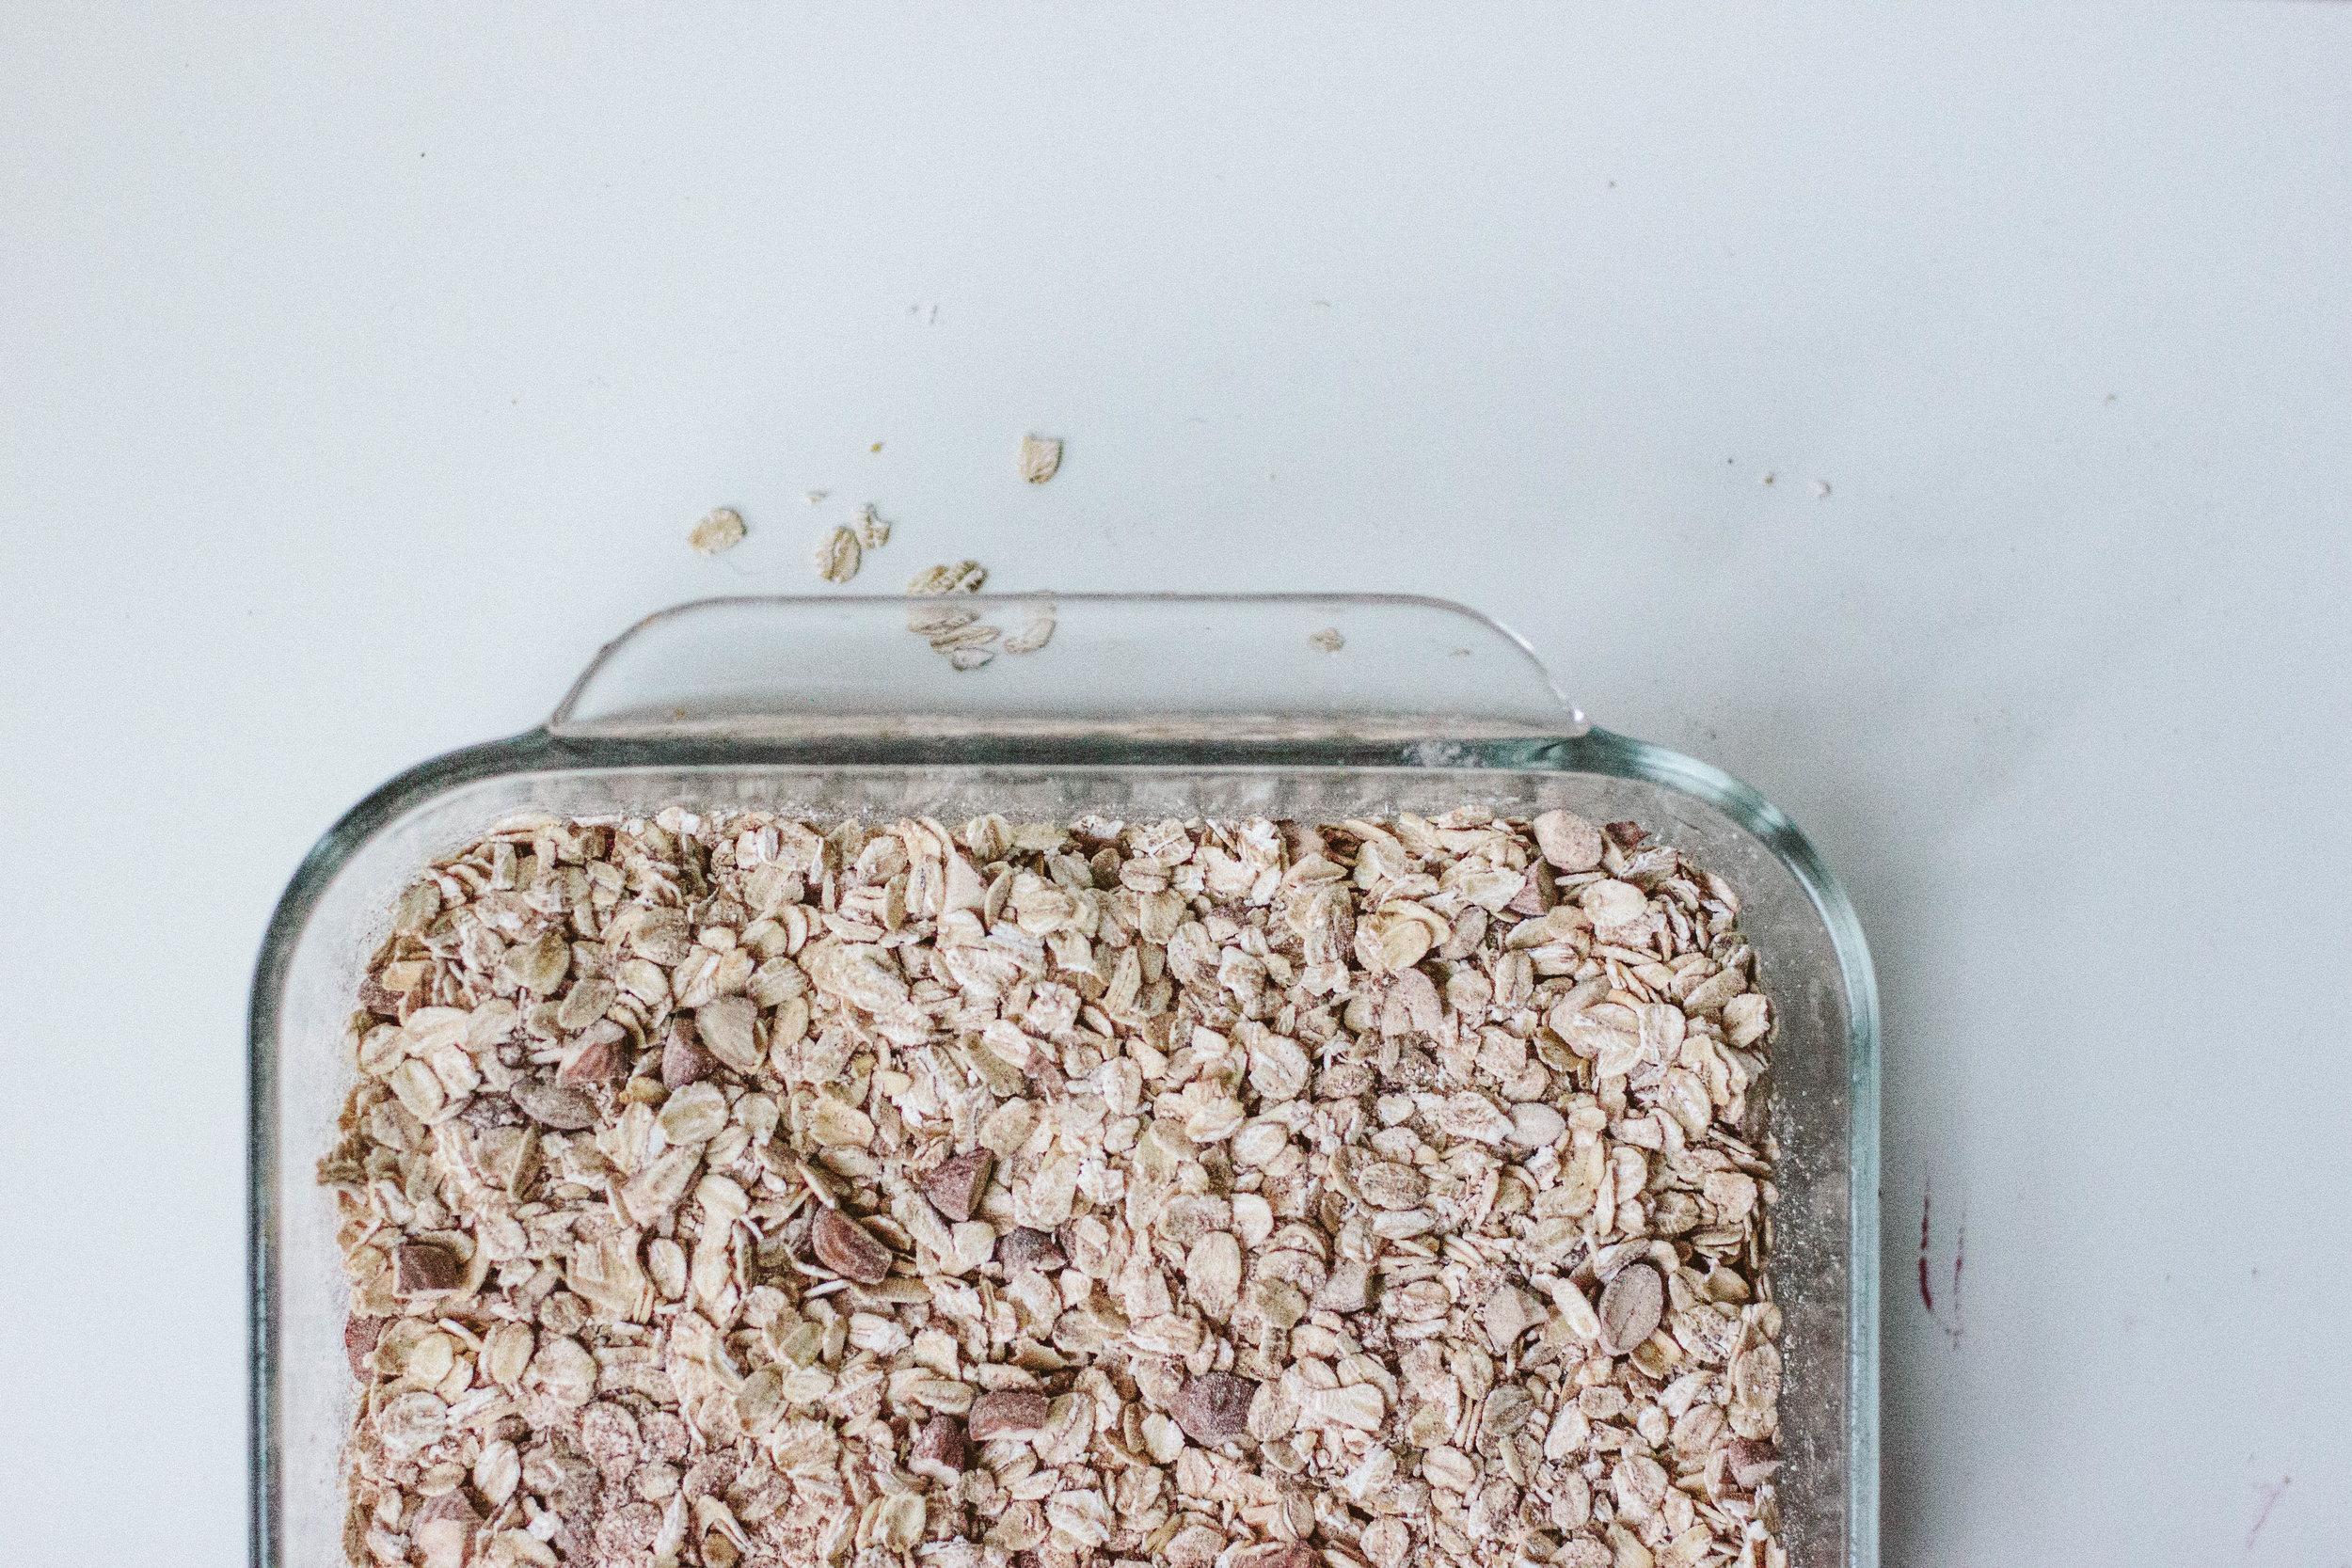 baked-oatmeal-6-1.jpg